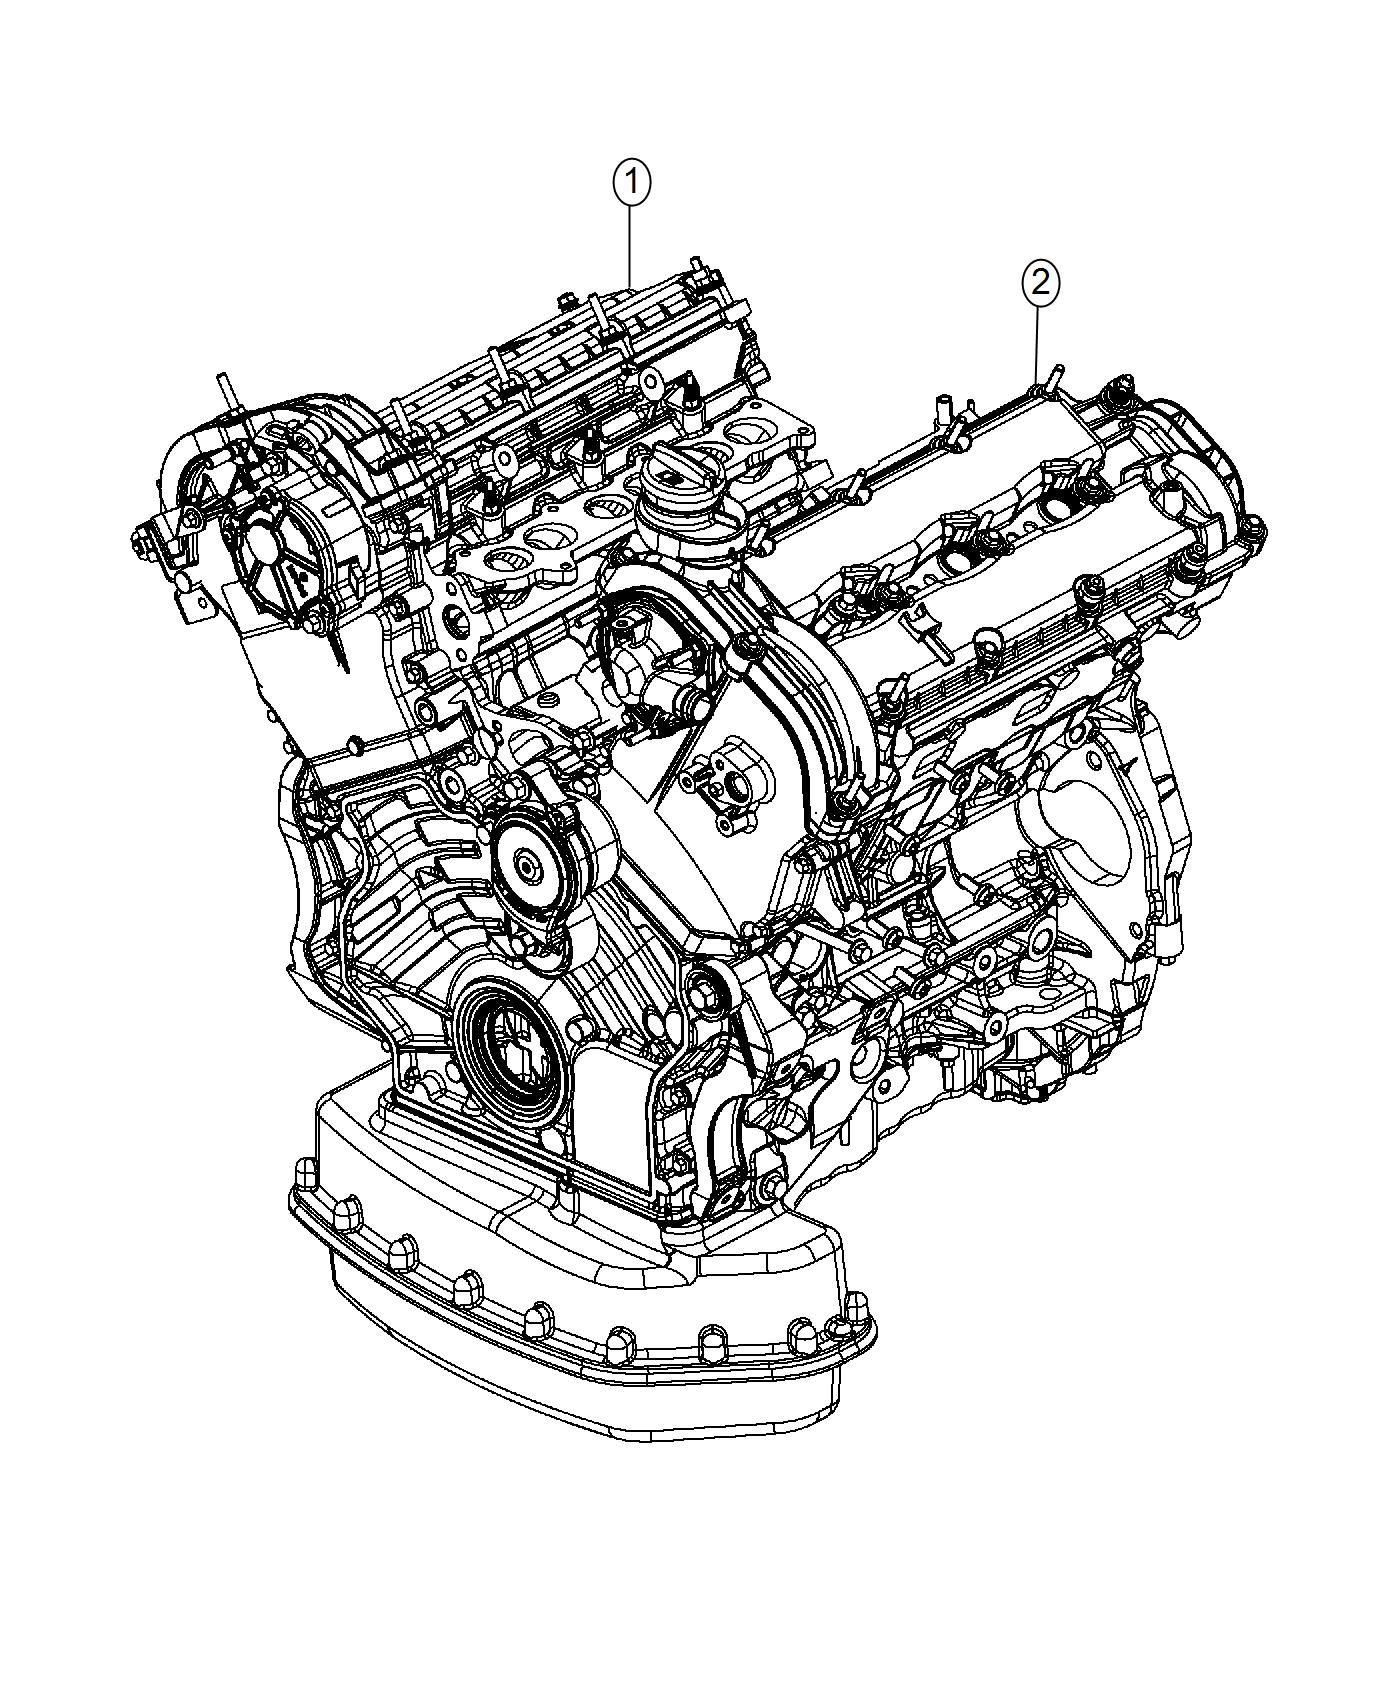 Jeep Grand Cherokee Engine Long Block